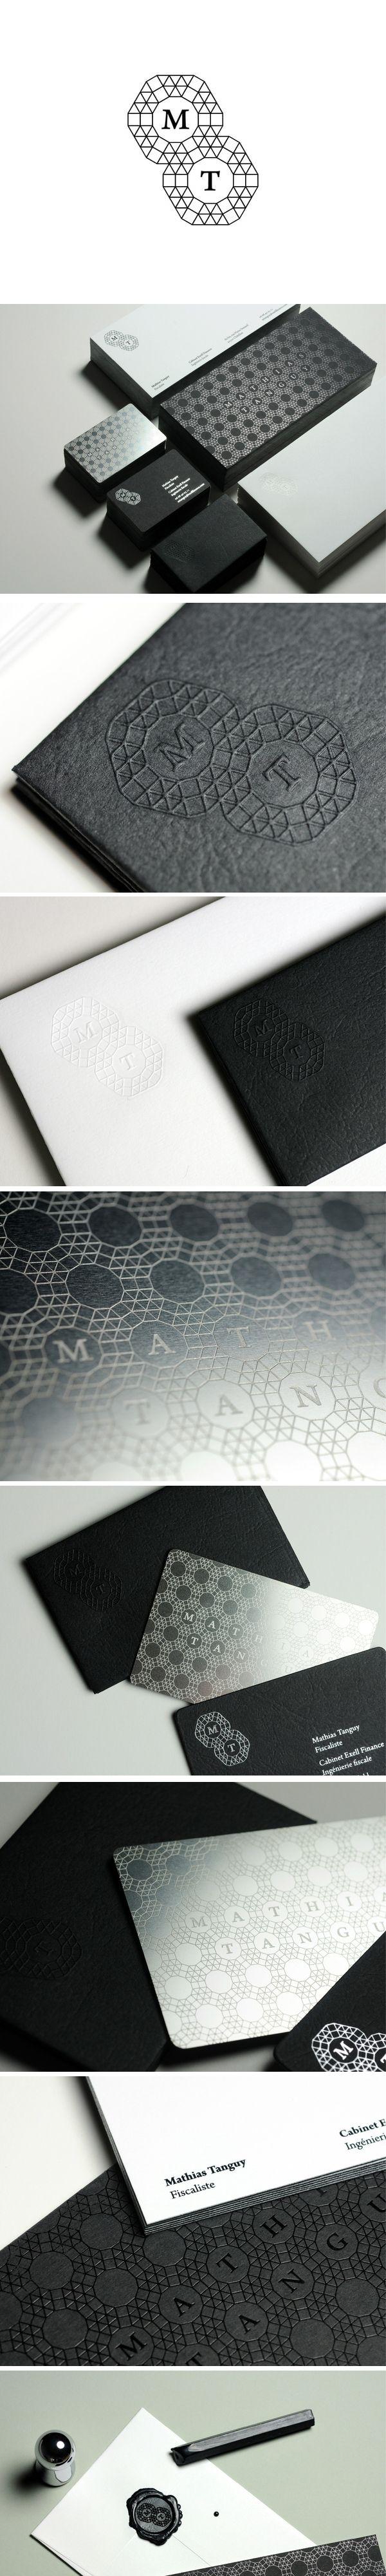 Visual identity | Stationery Design for Mathias Tanguy via Branding Served.